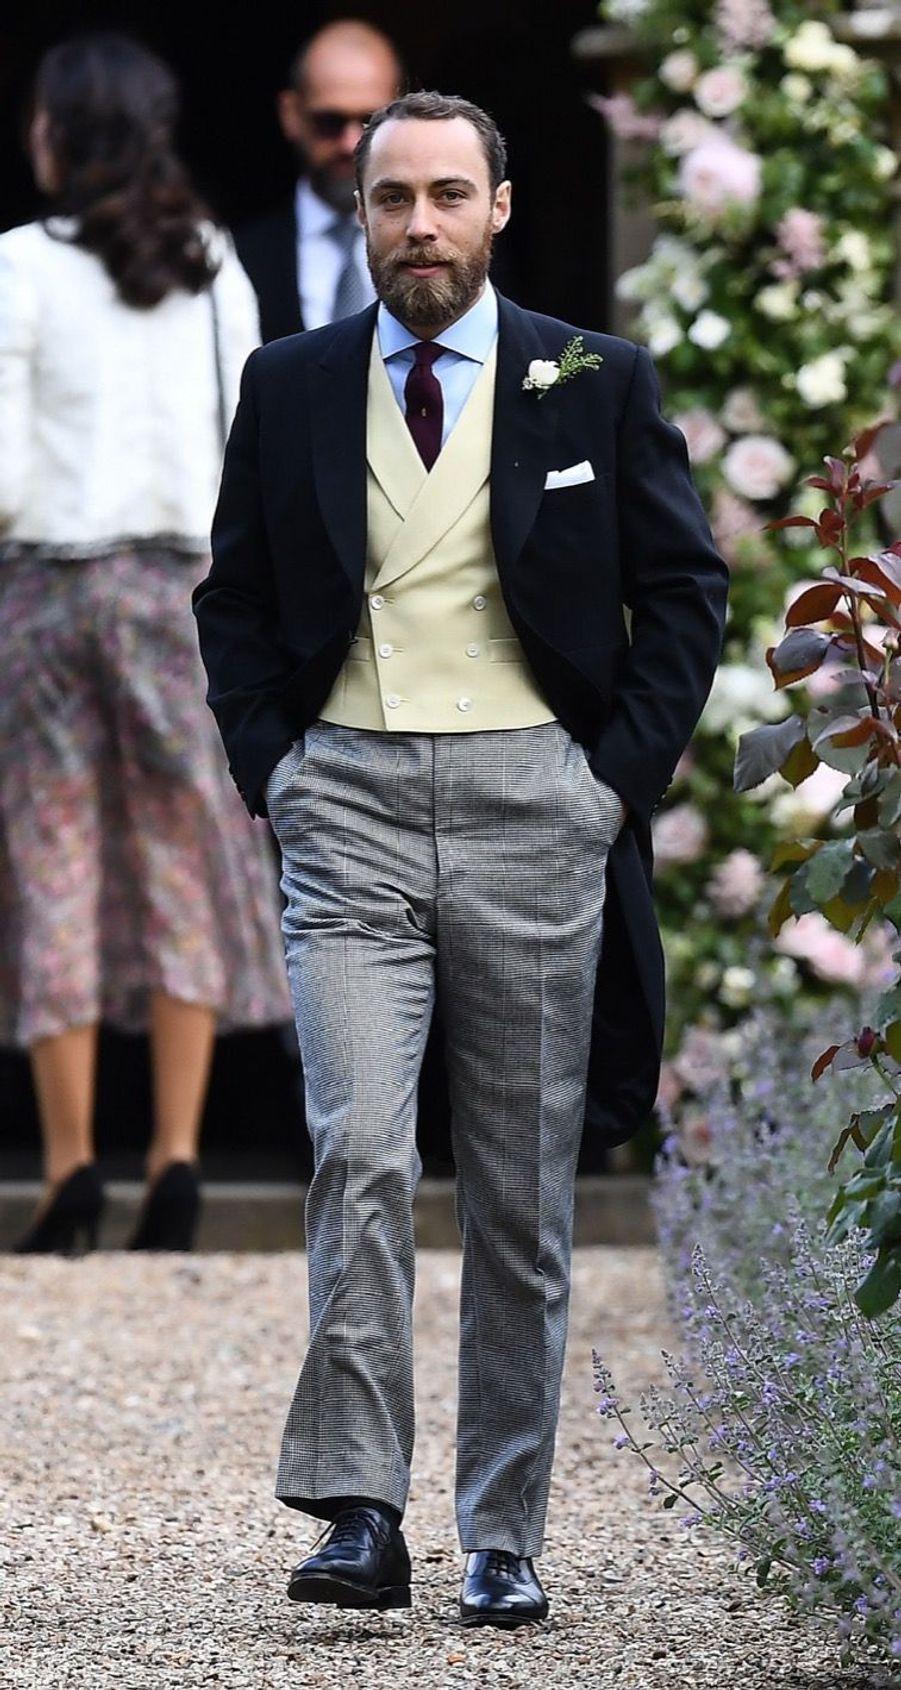 James Middleton, le frère de Kate et Pippa arrive au mariage de Pippa Middleton, samedi 20 mai